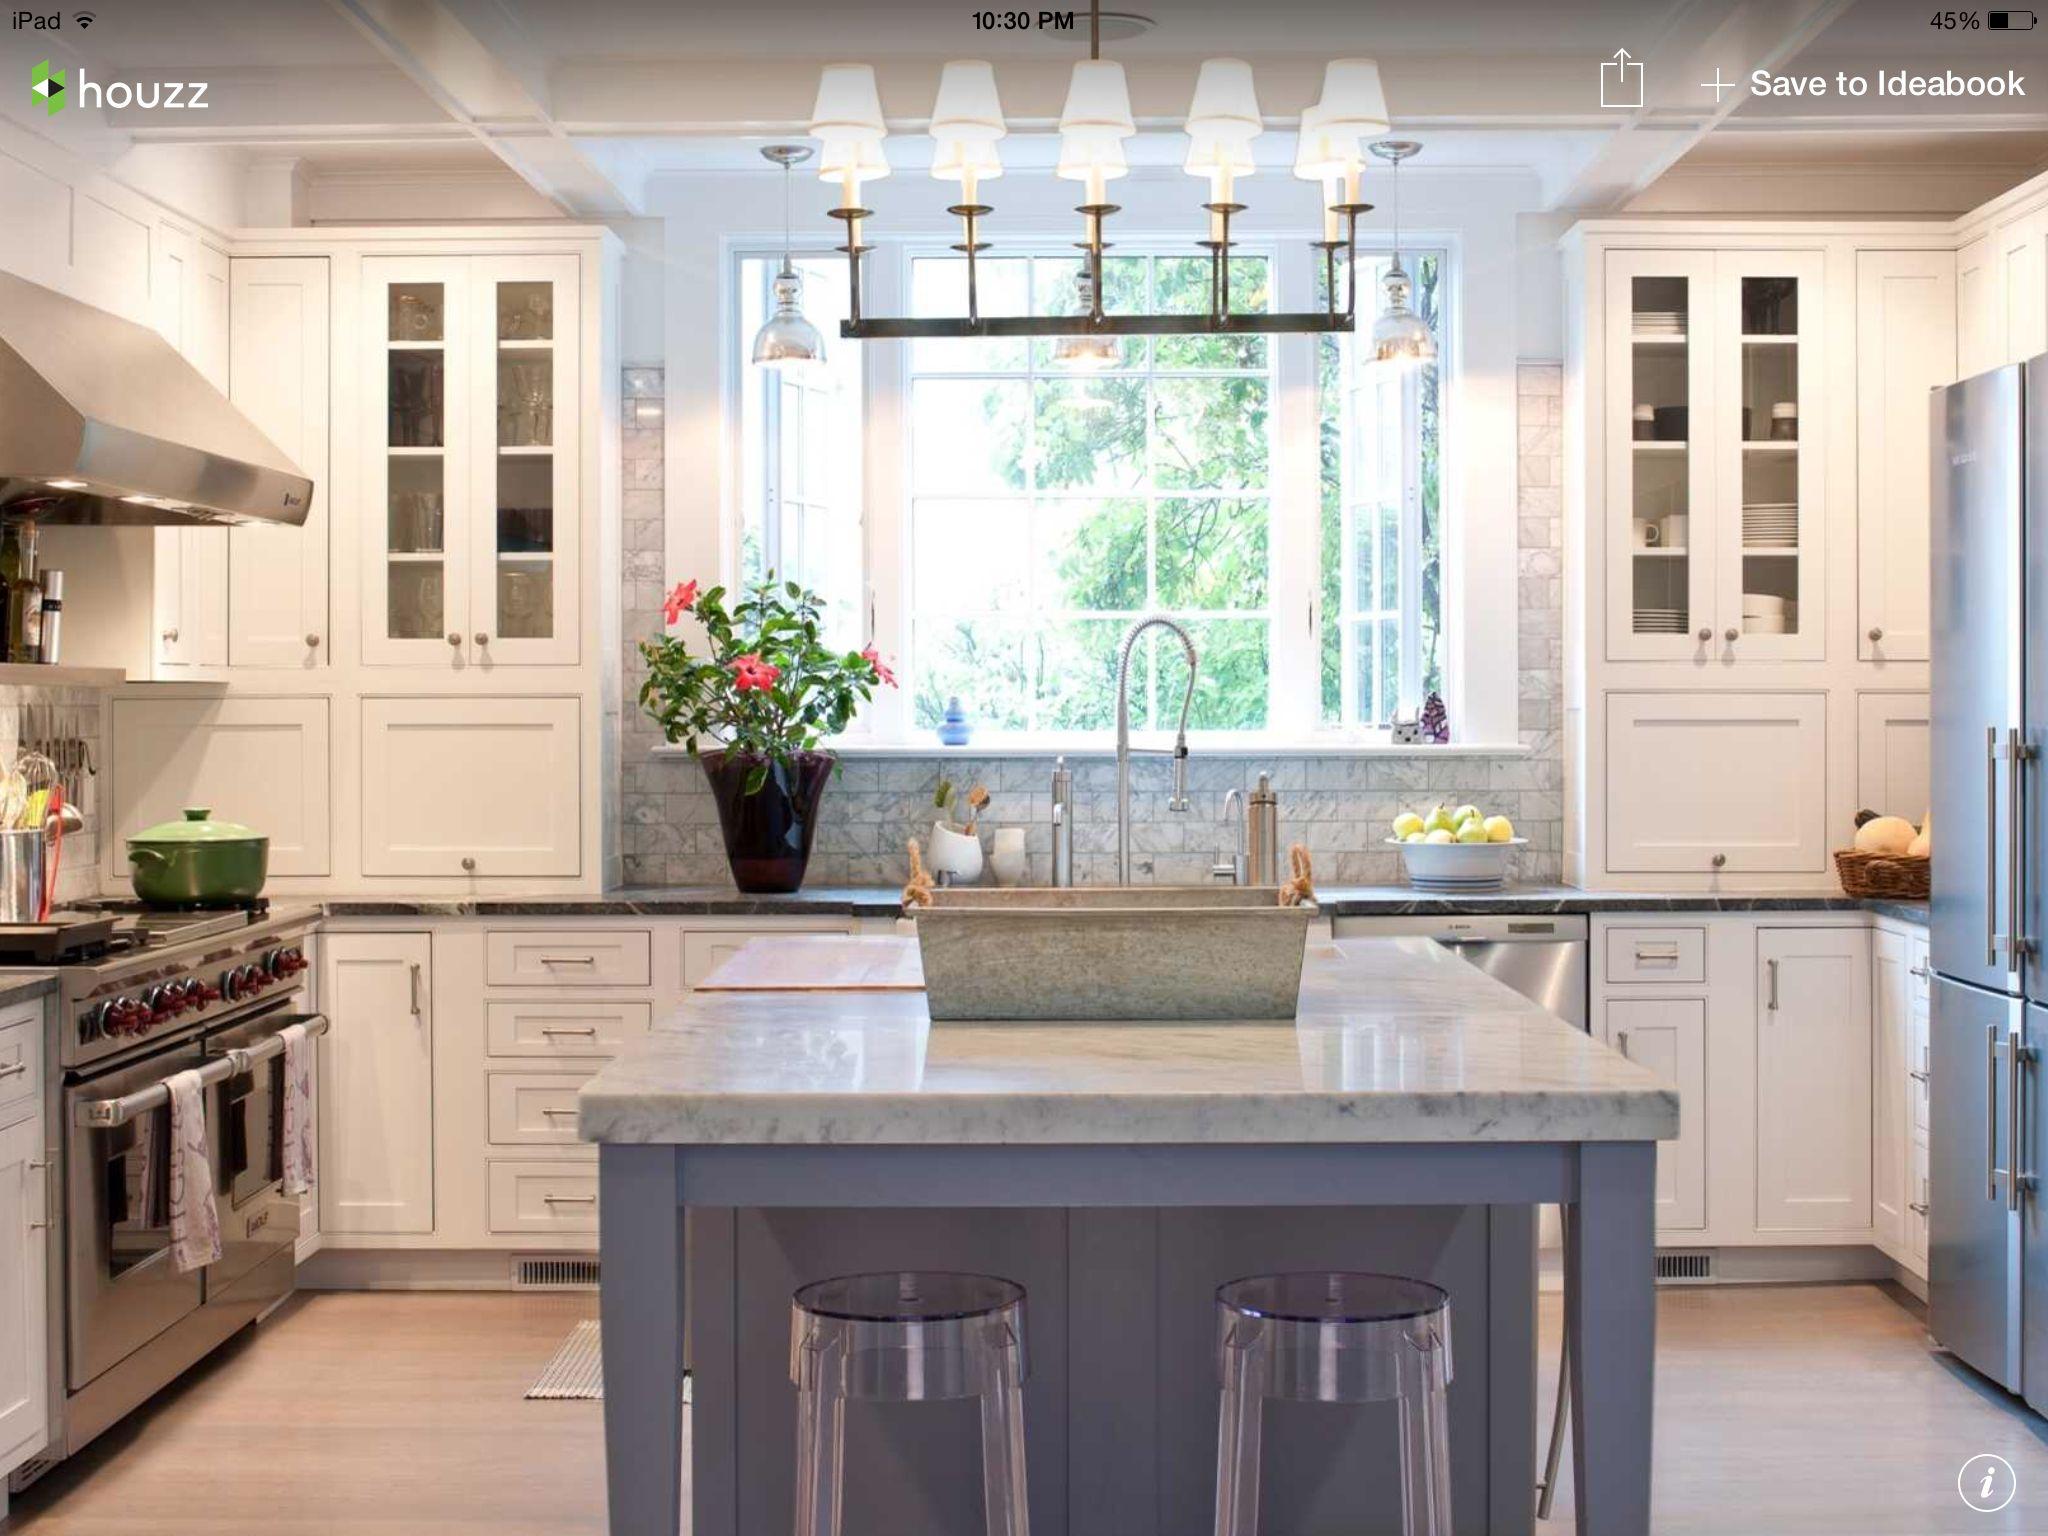 Kitchens Country Kitchen Backsplash Kitchen Cabinet Styles Country Kitchen